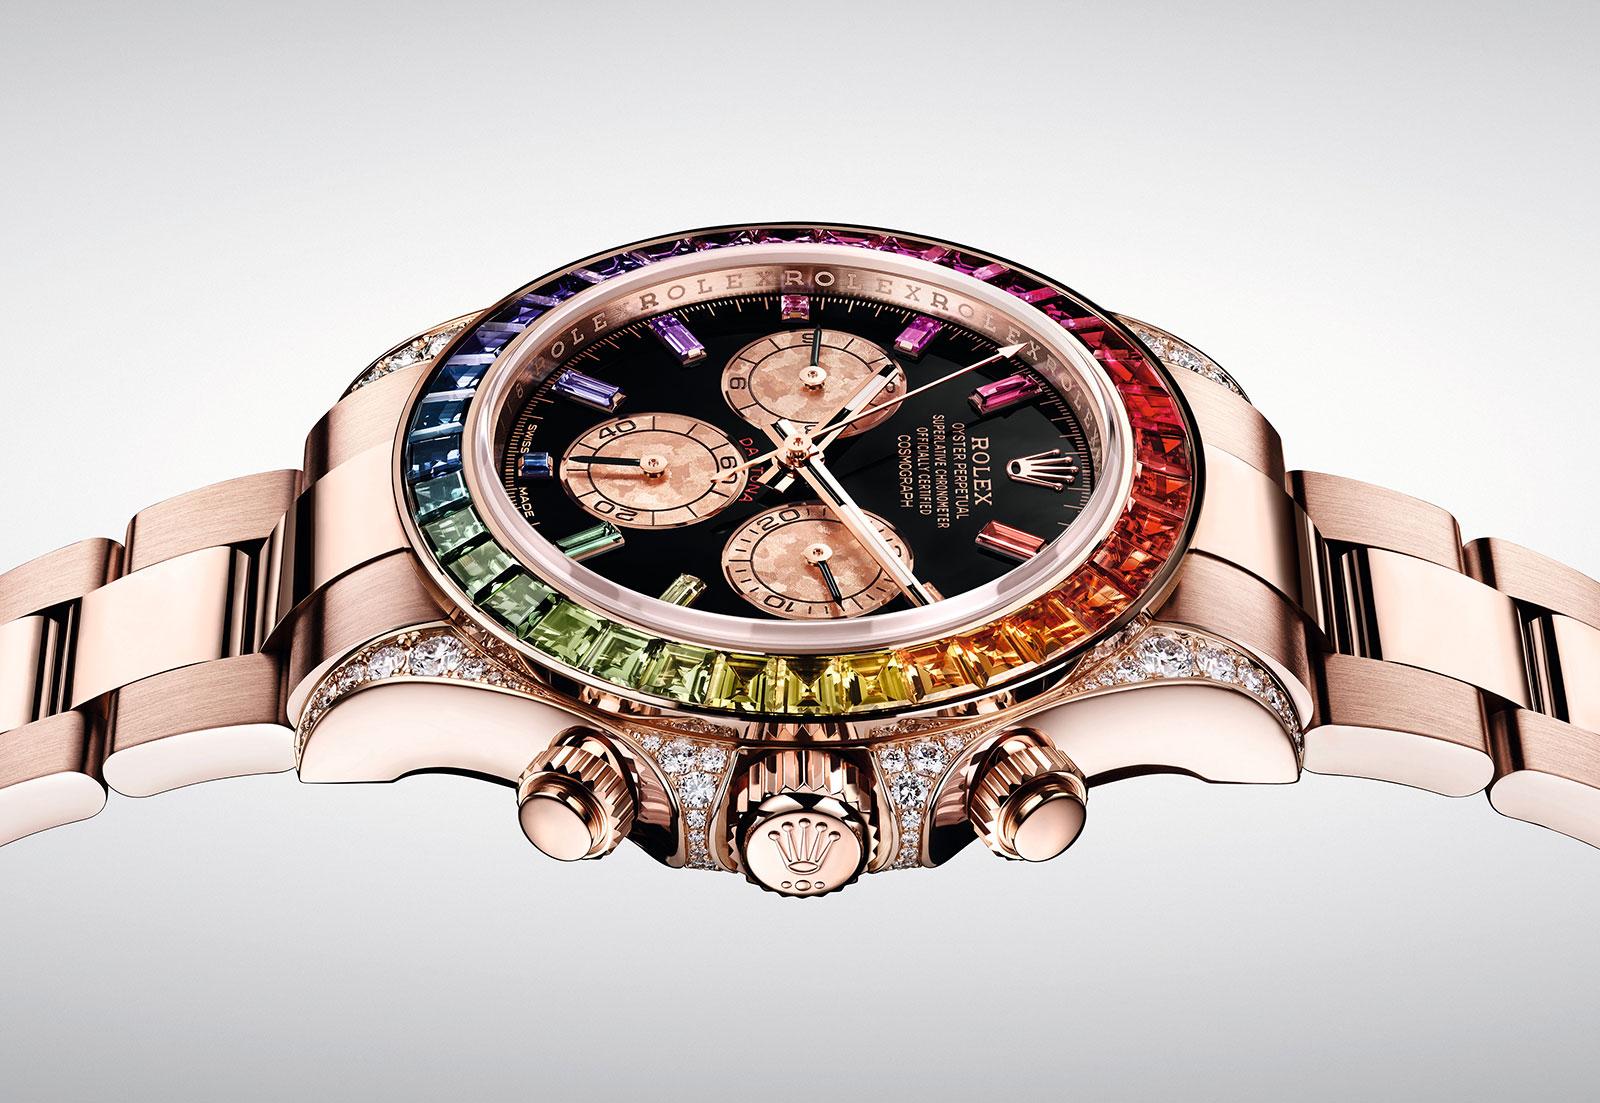 Rolex Daytona Rainbow Everose 116595 RBOW 4